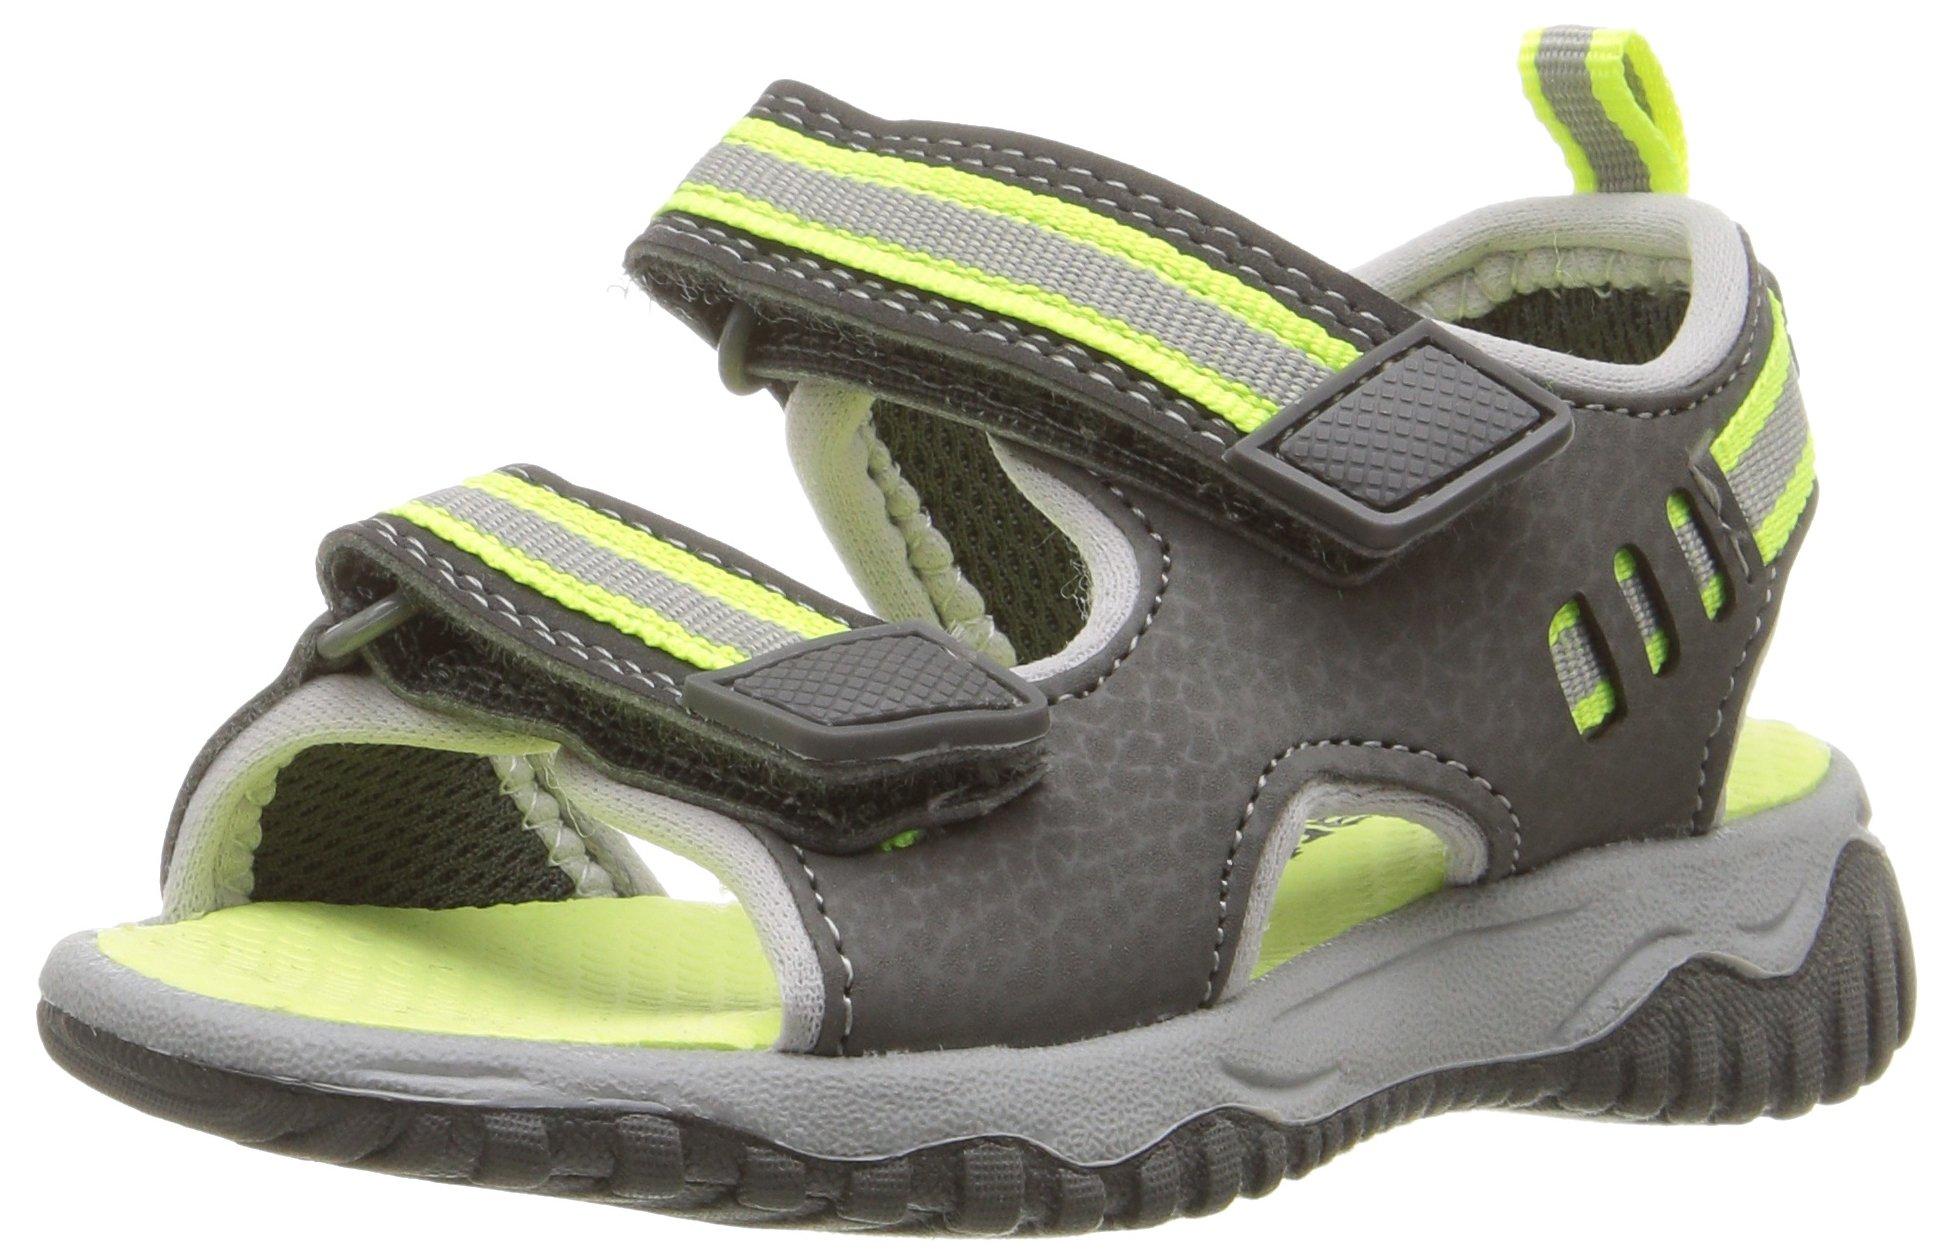 Carter's Oracio Boy's Sandal, Grey/Yellow, 10 M US Toddler